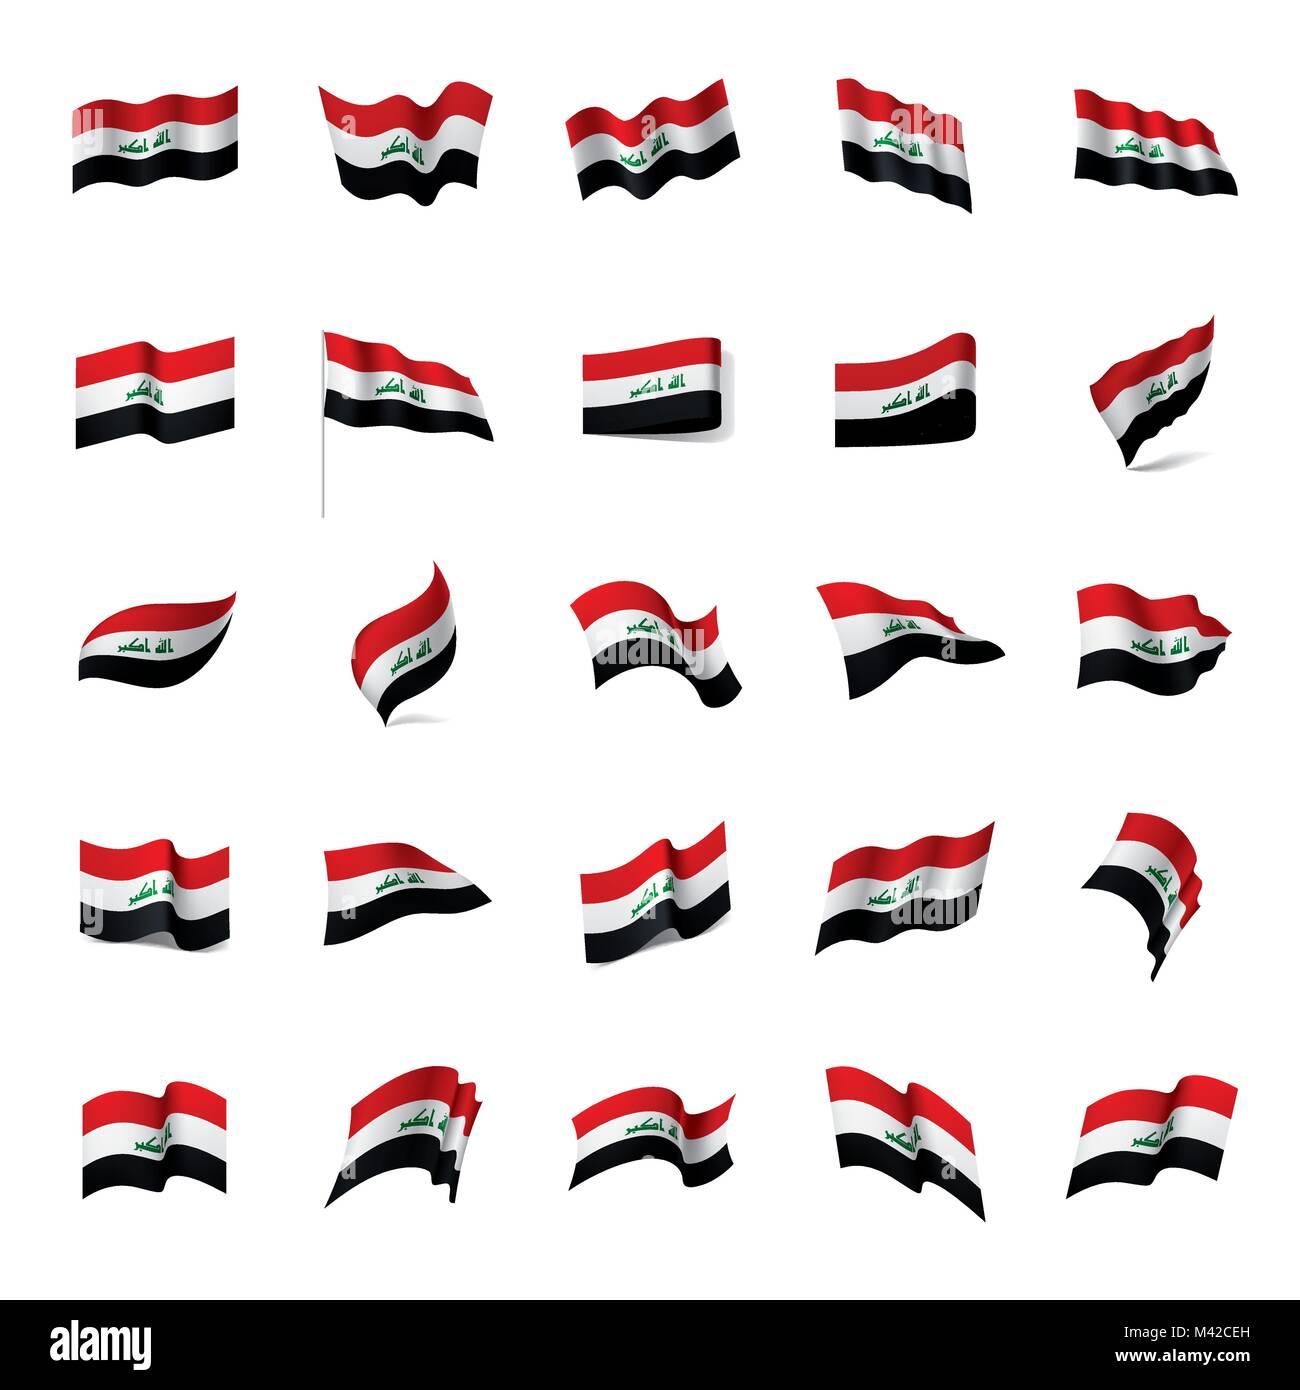 Iraqi flag, vector illustration - Stock Image